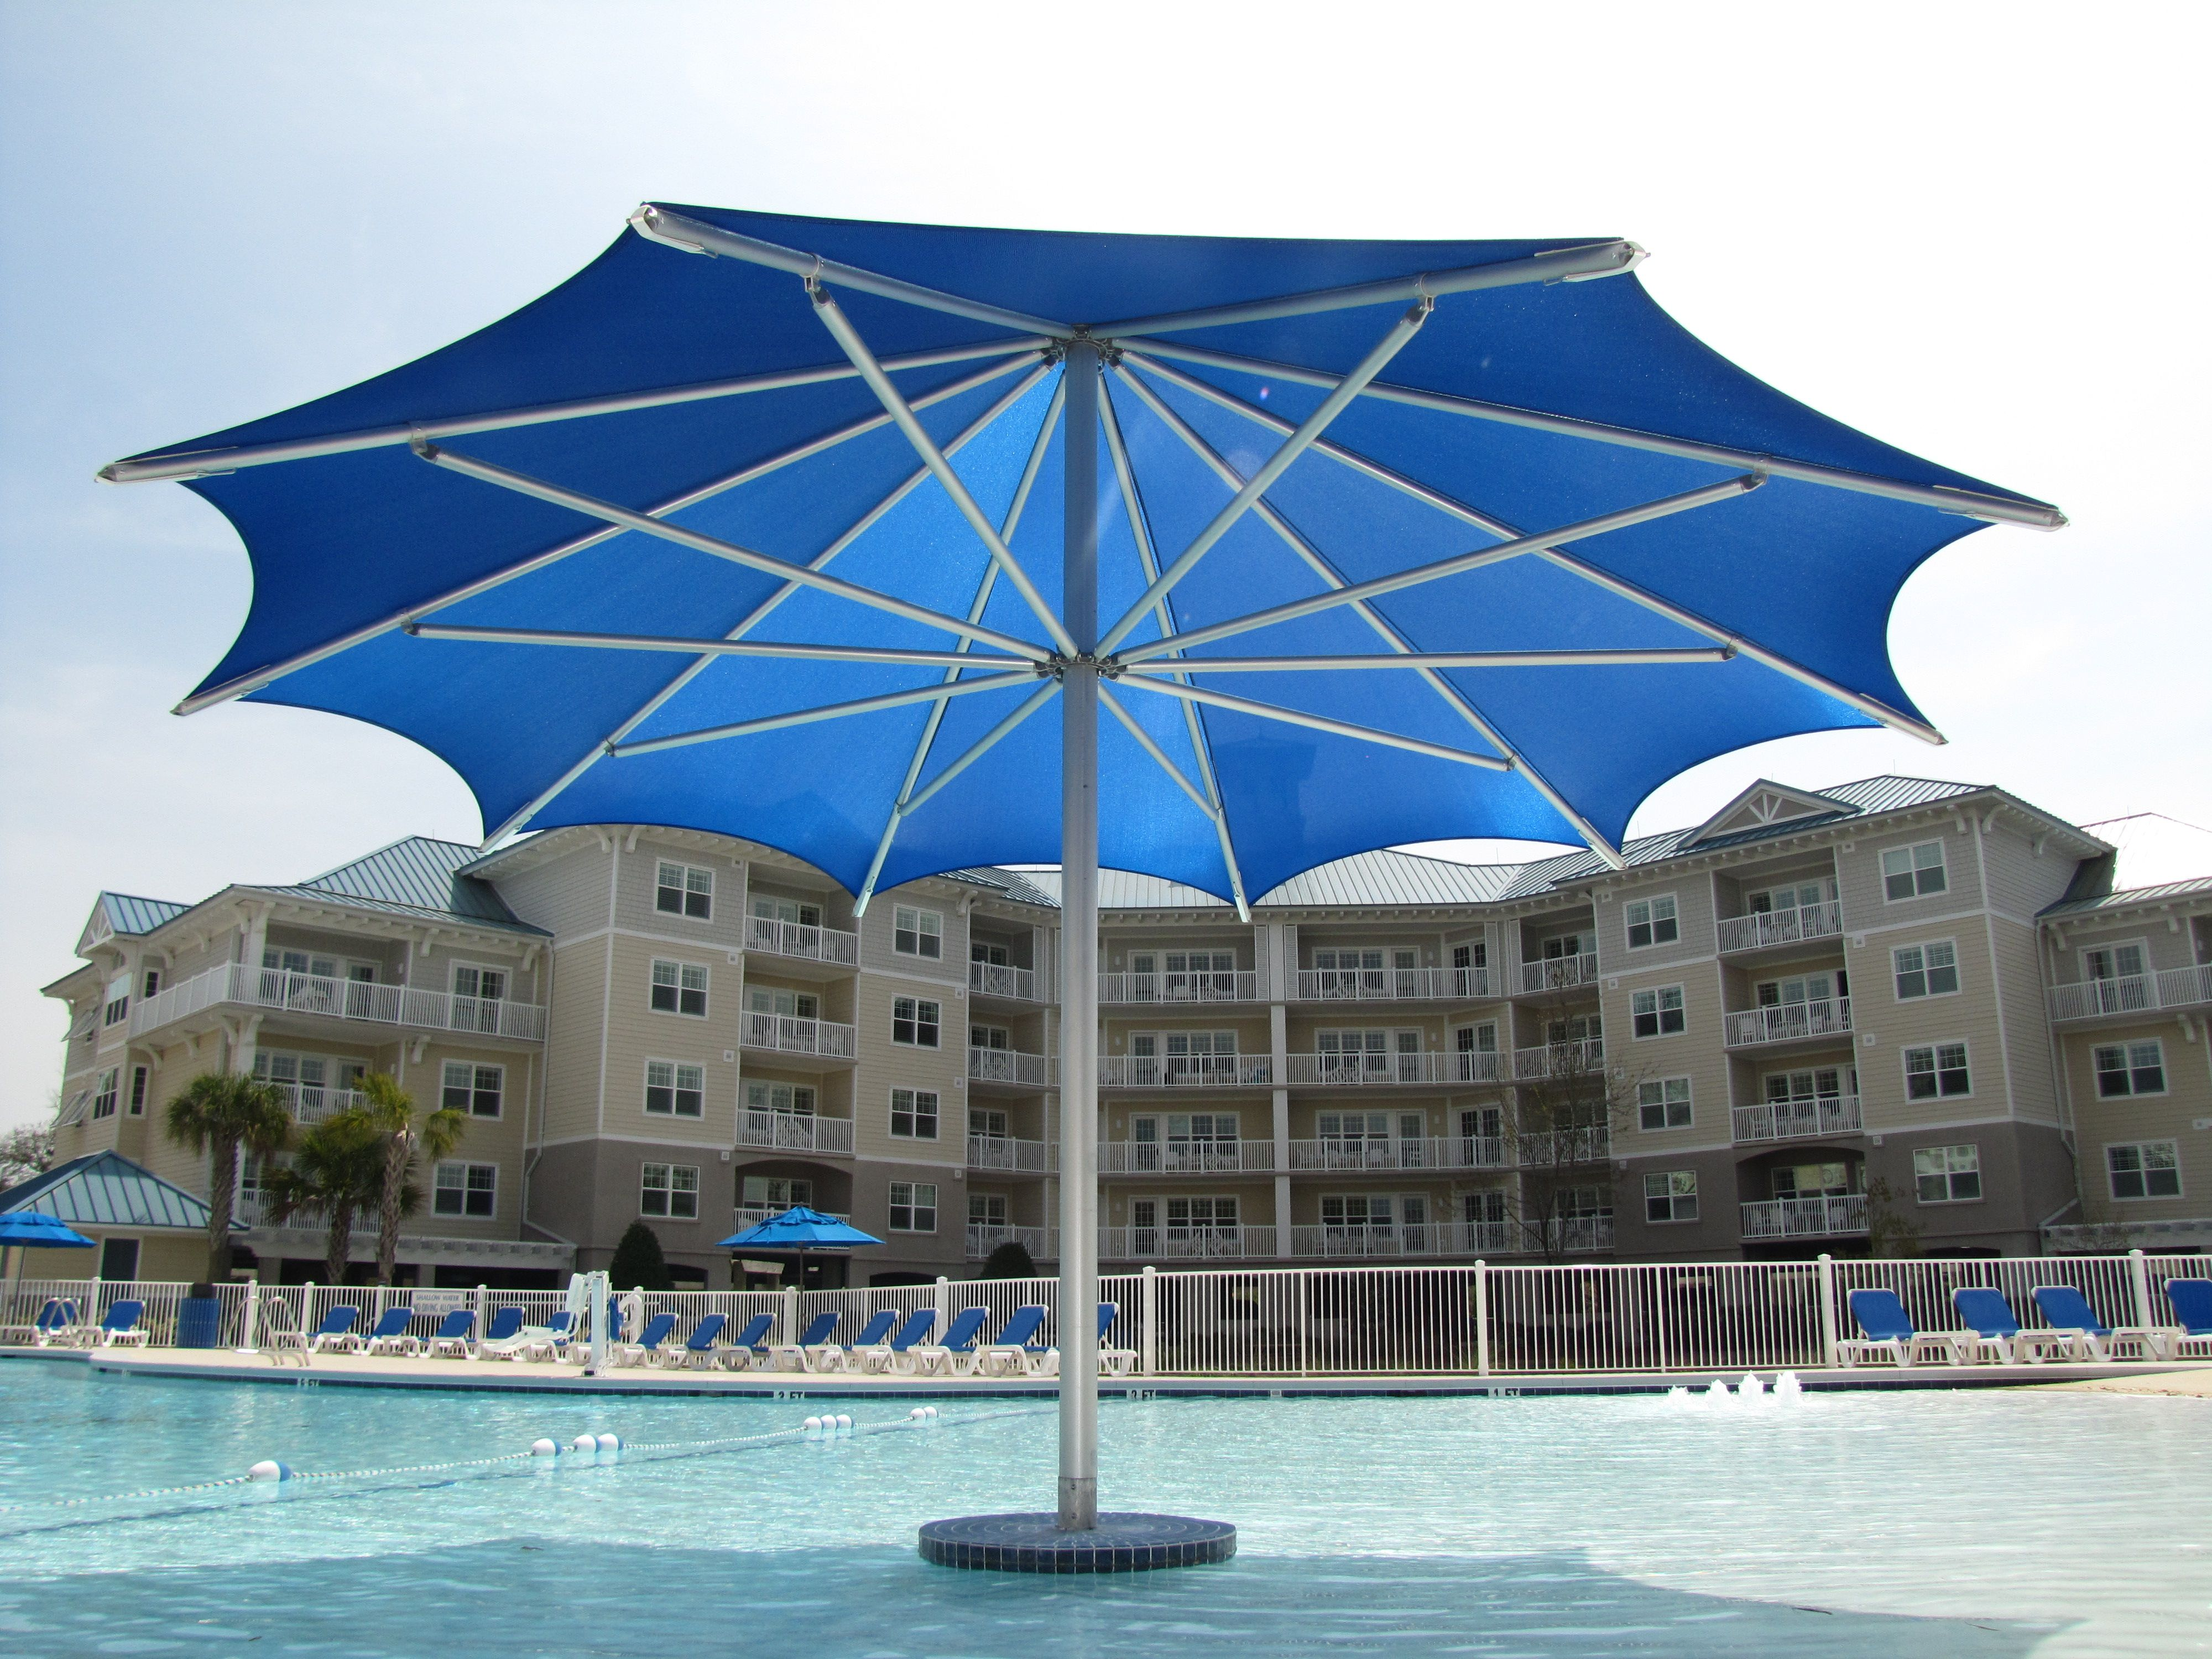 Bluewater Resort Marina Hilton Head Sc Hilton Head Island